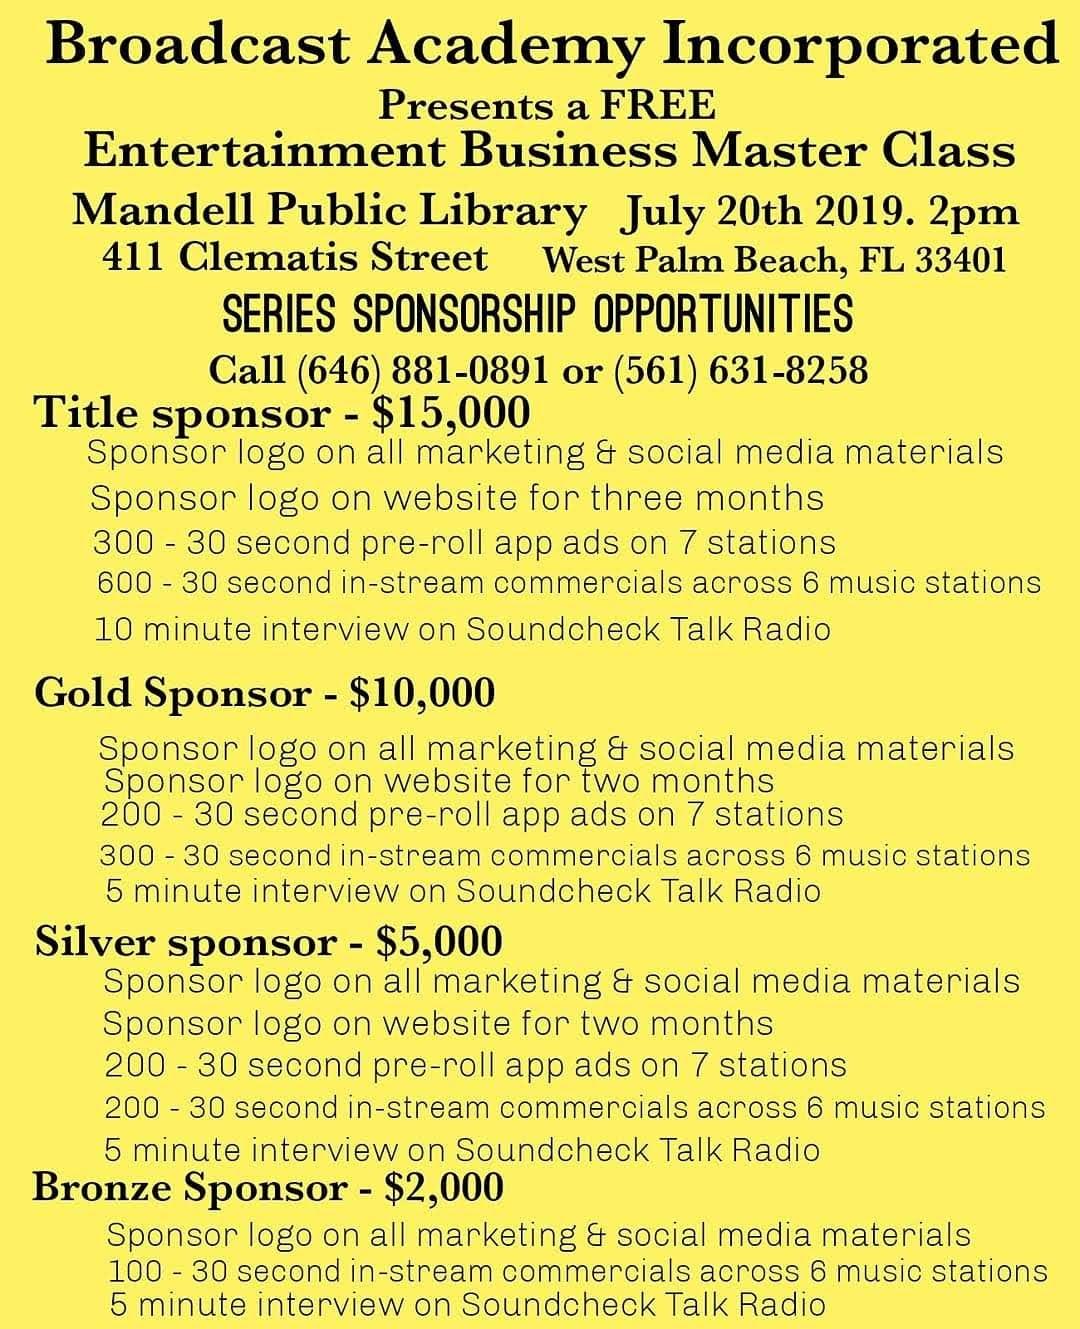 Entertainment Business Master Class Series Sponsorships